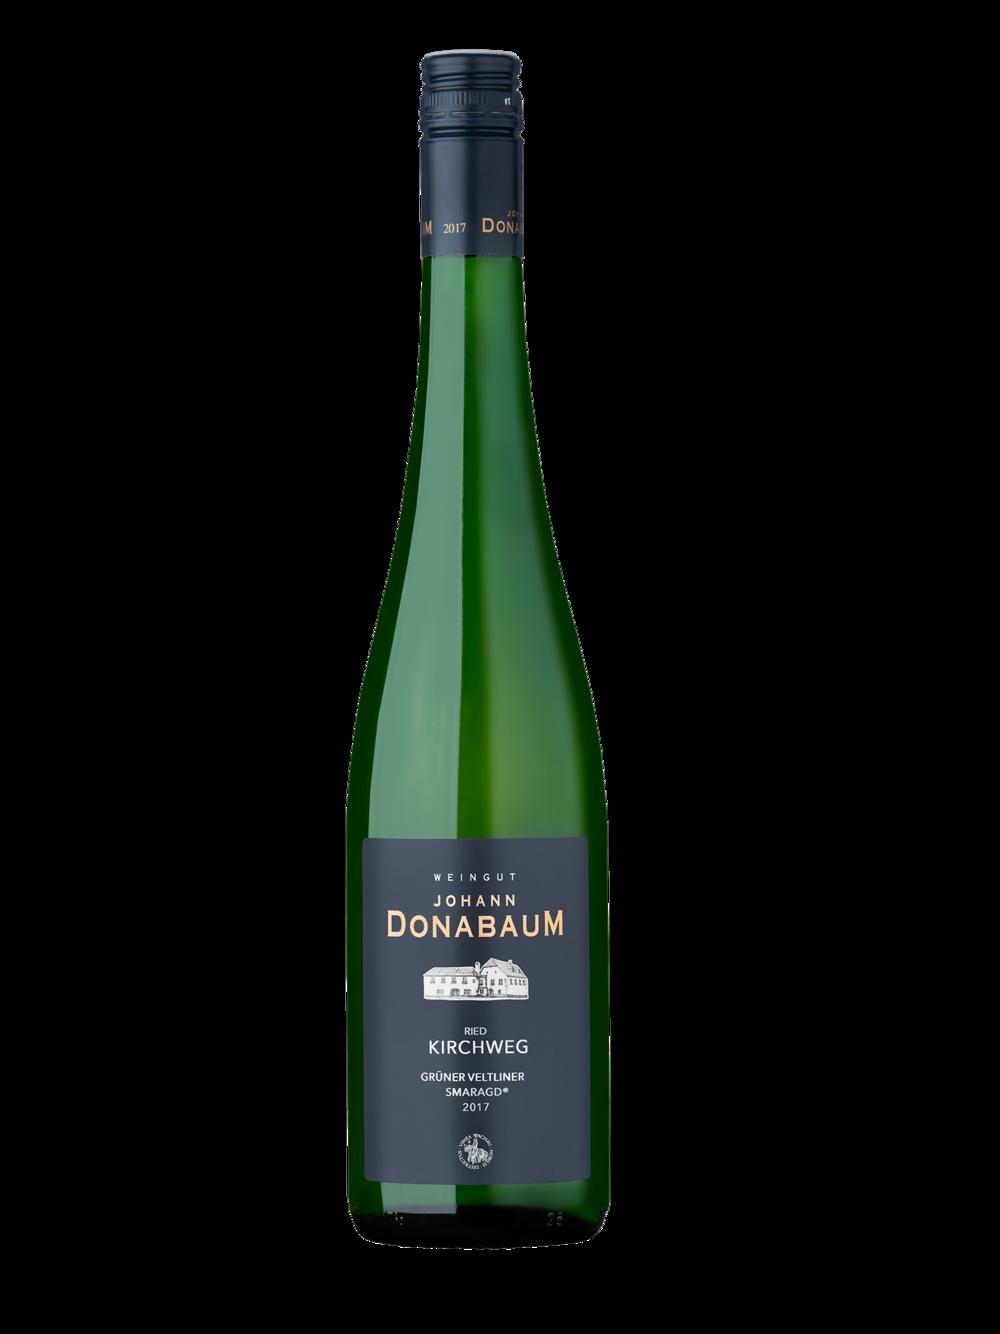 Weingut Johann Donabaum - Kirchweg